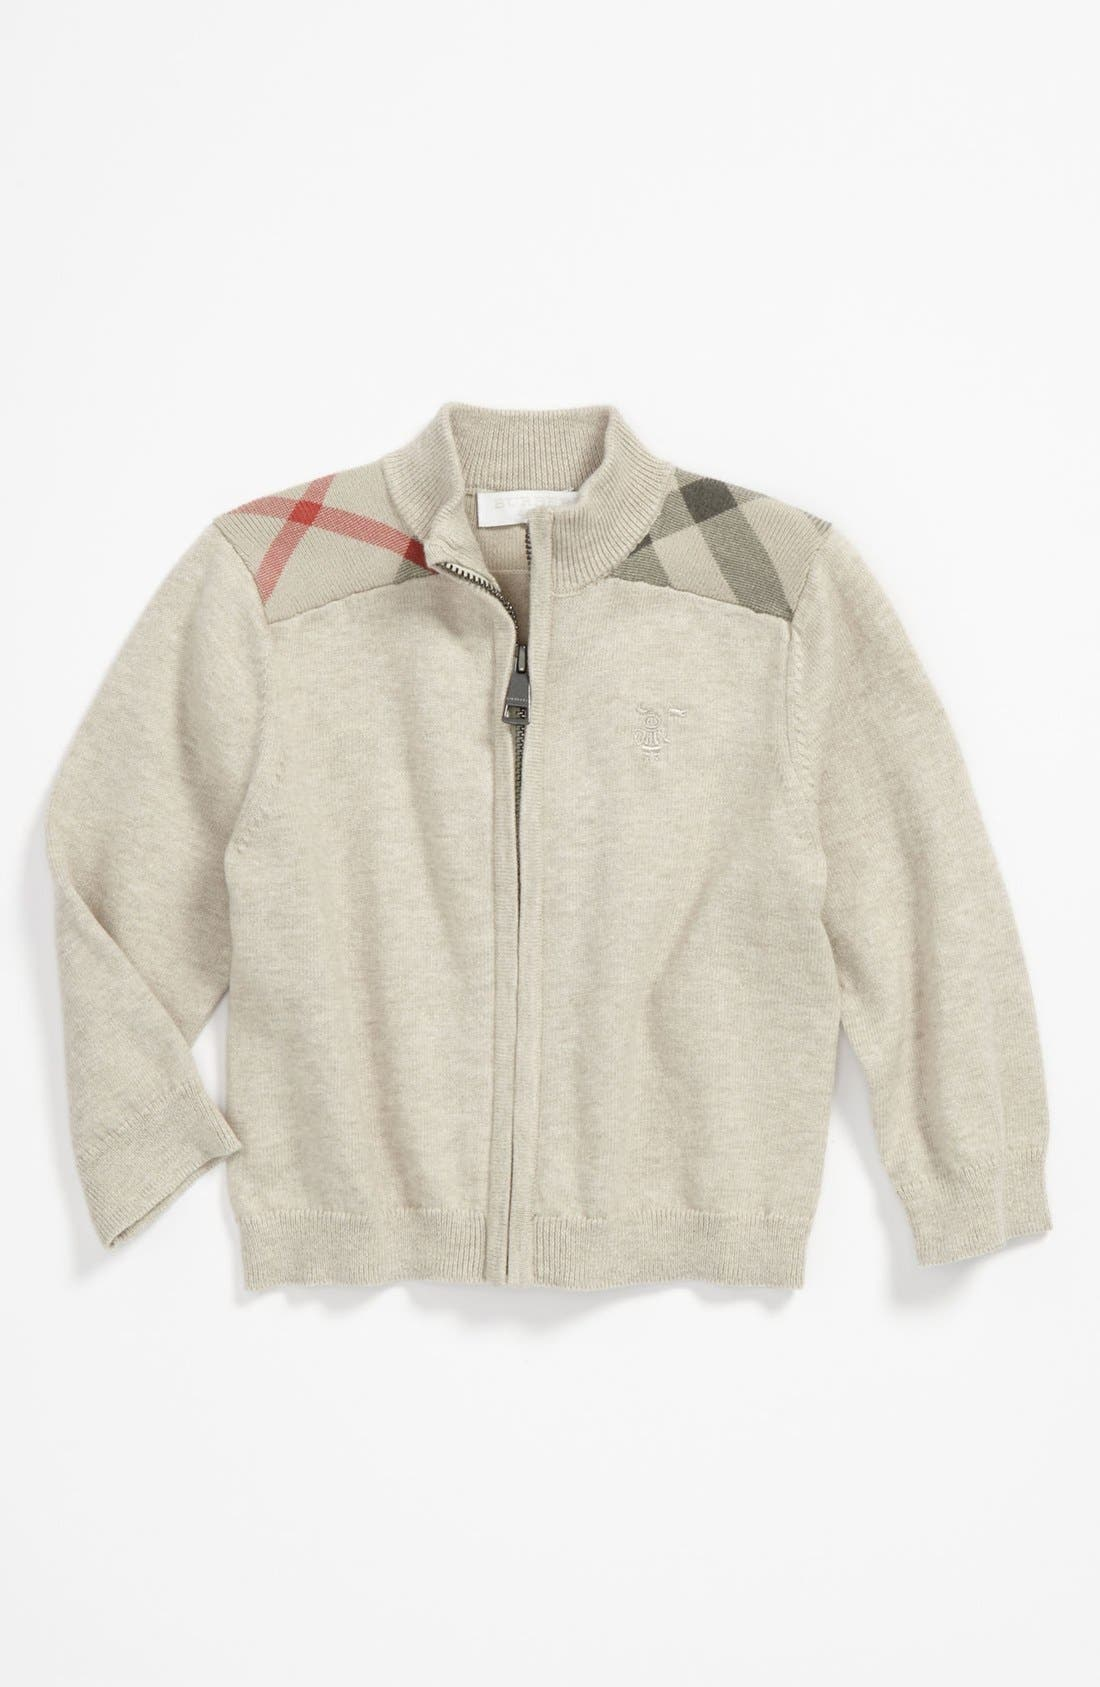 Main Image - Burberry 'Christian' Sweater (Toddler)